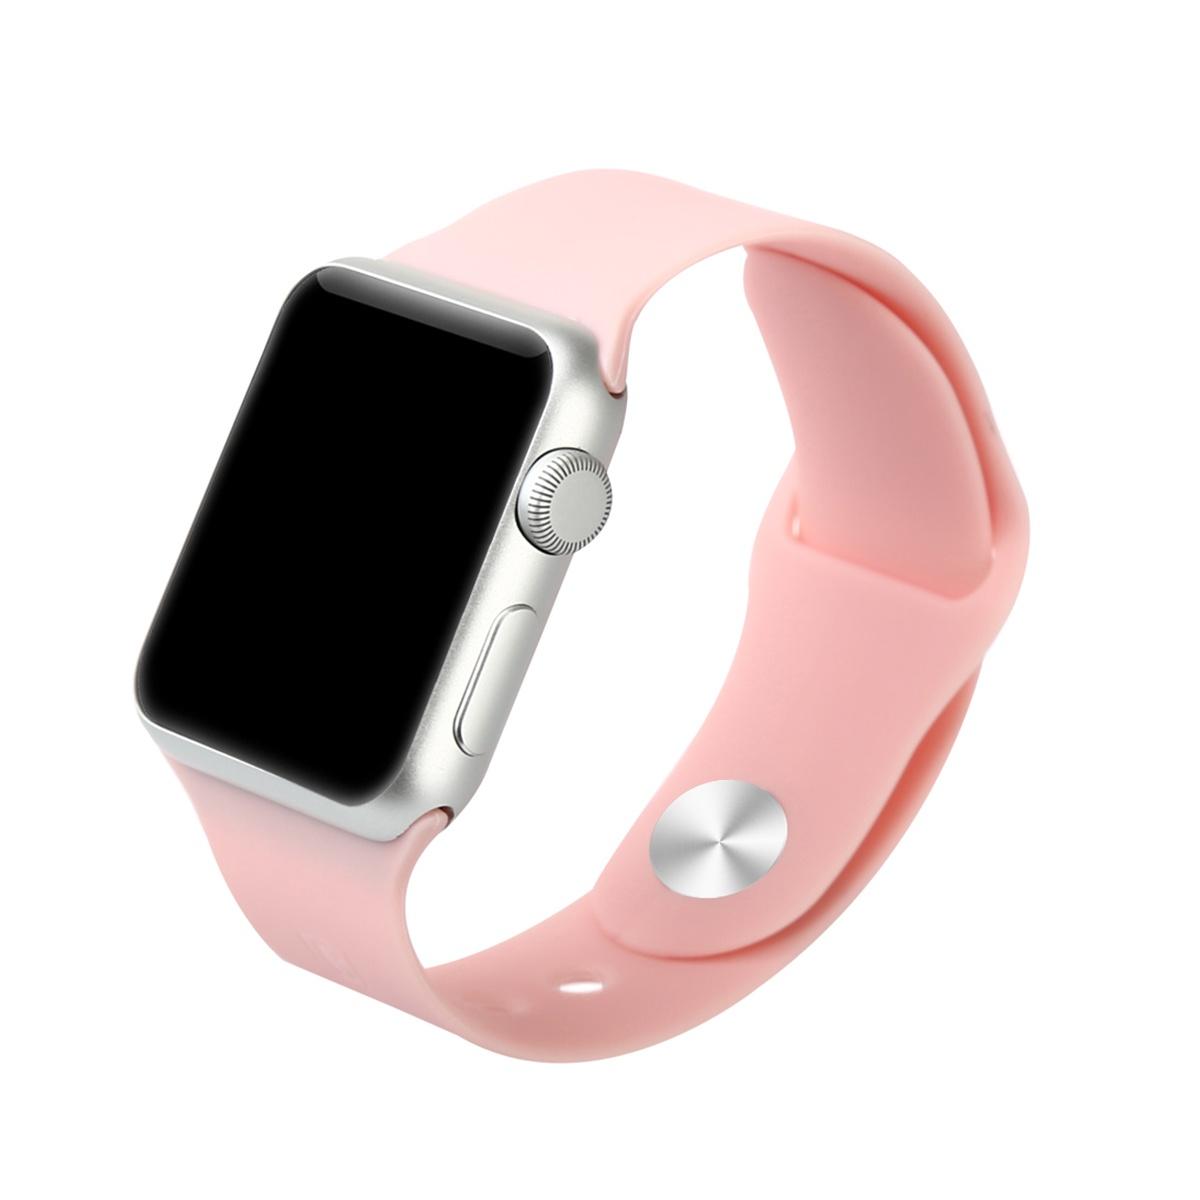 Ремешок для смарт-часов Aceshley Luxe Pink 42, 12388, розовый цены онлайн